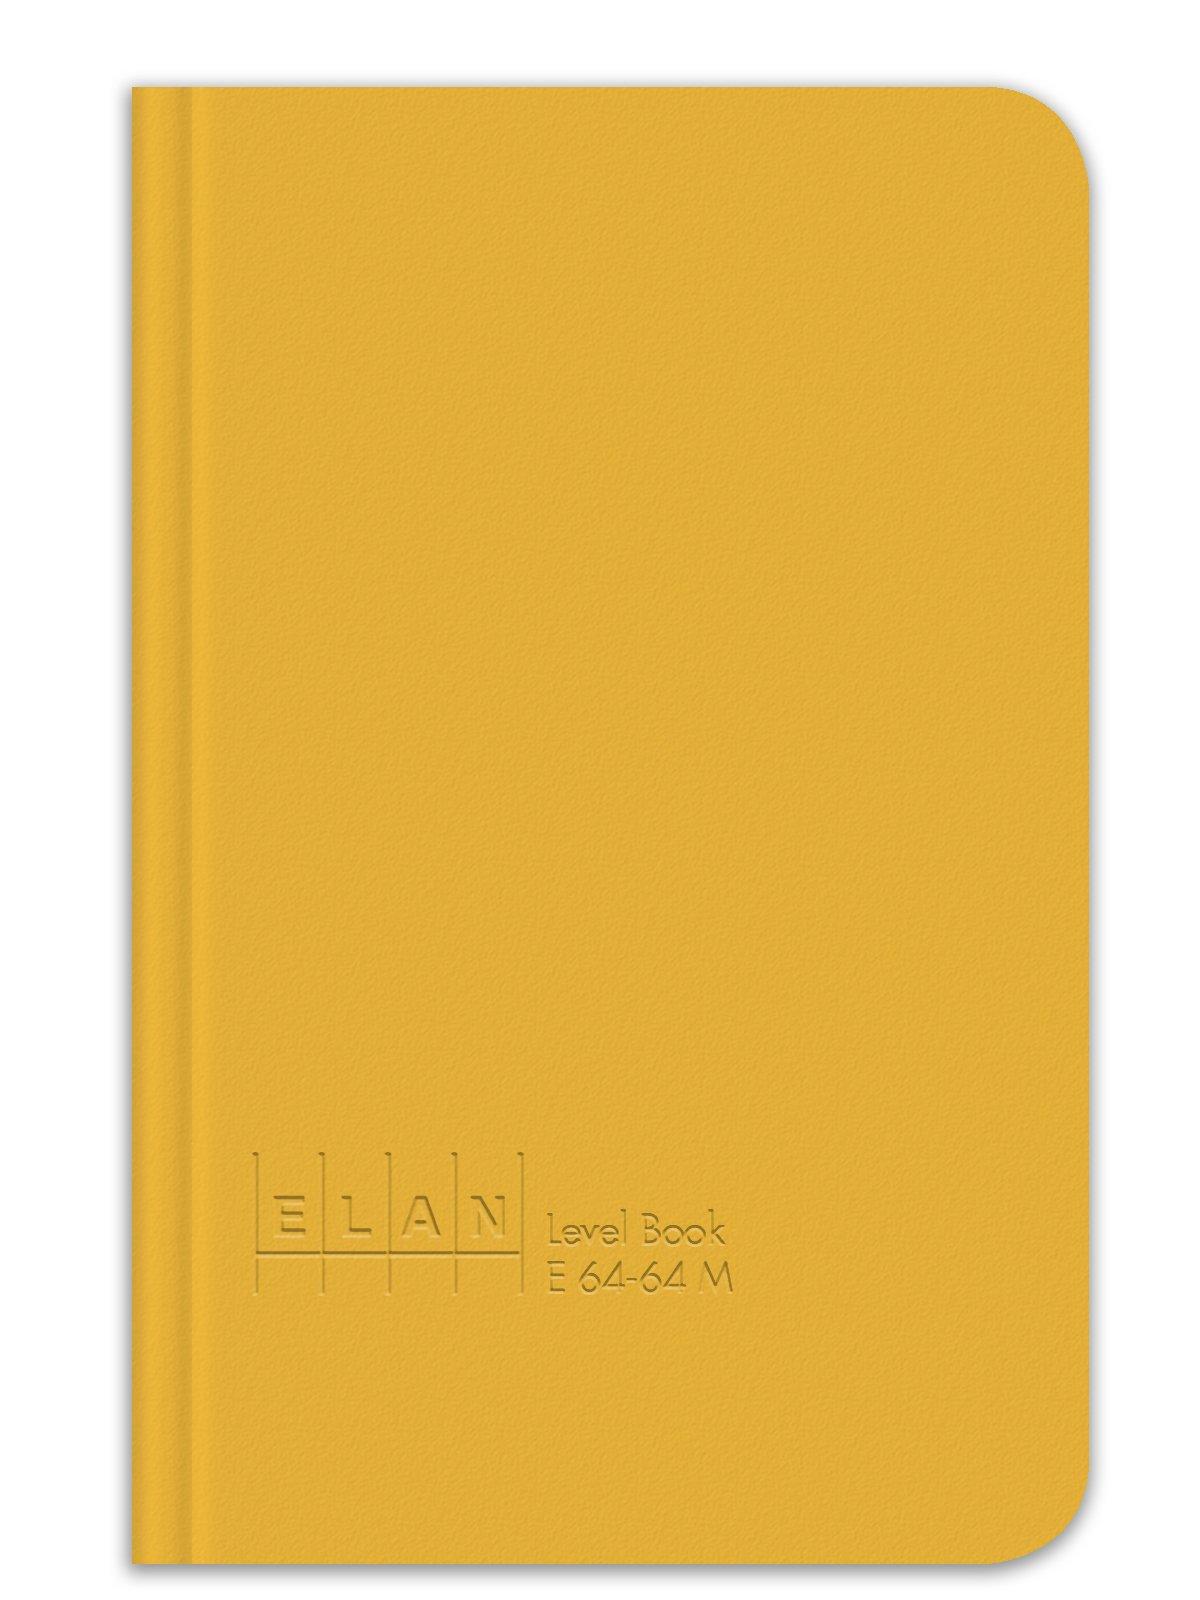 Elan Publishing Company E64-64M Mini Level Book 4 ⅛ x 6 ½, Yellow Cover (Pack of 48)